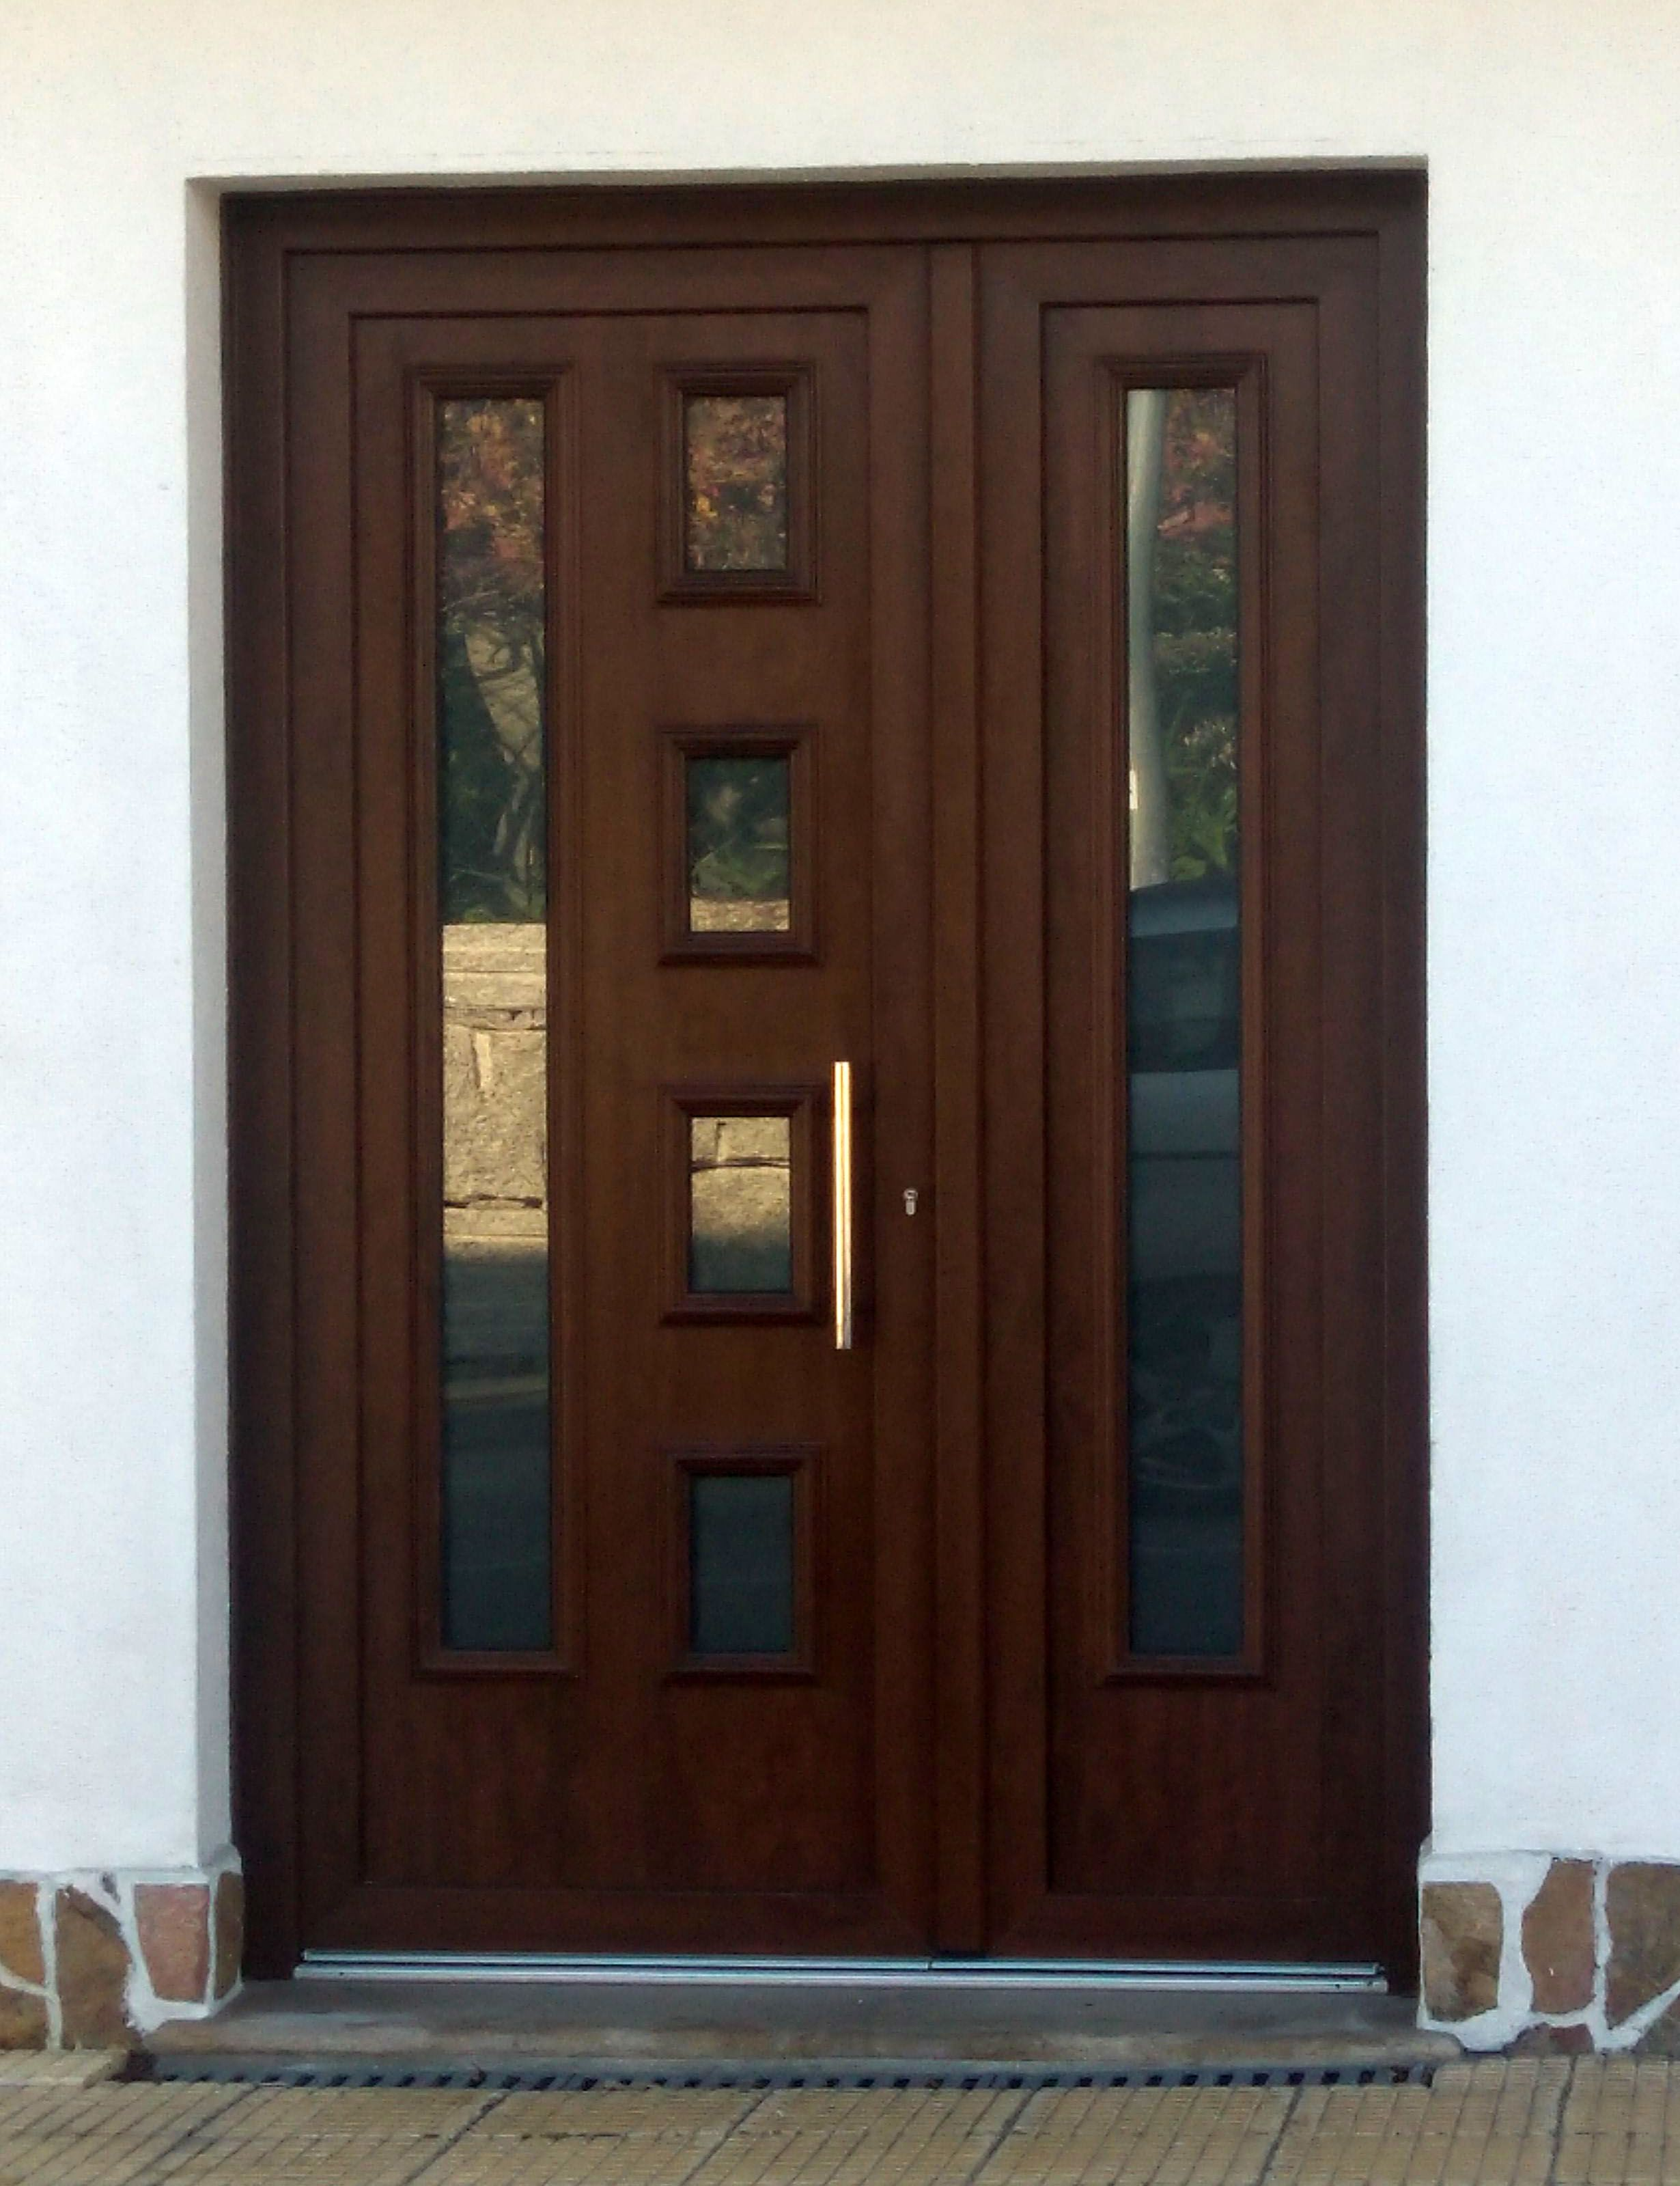 Tempo lira aluminio foliado indupanel paneles puertas for Agarraderas para puertas de vidrio